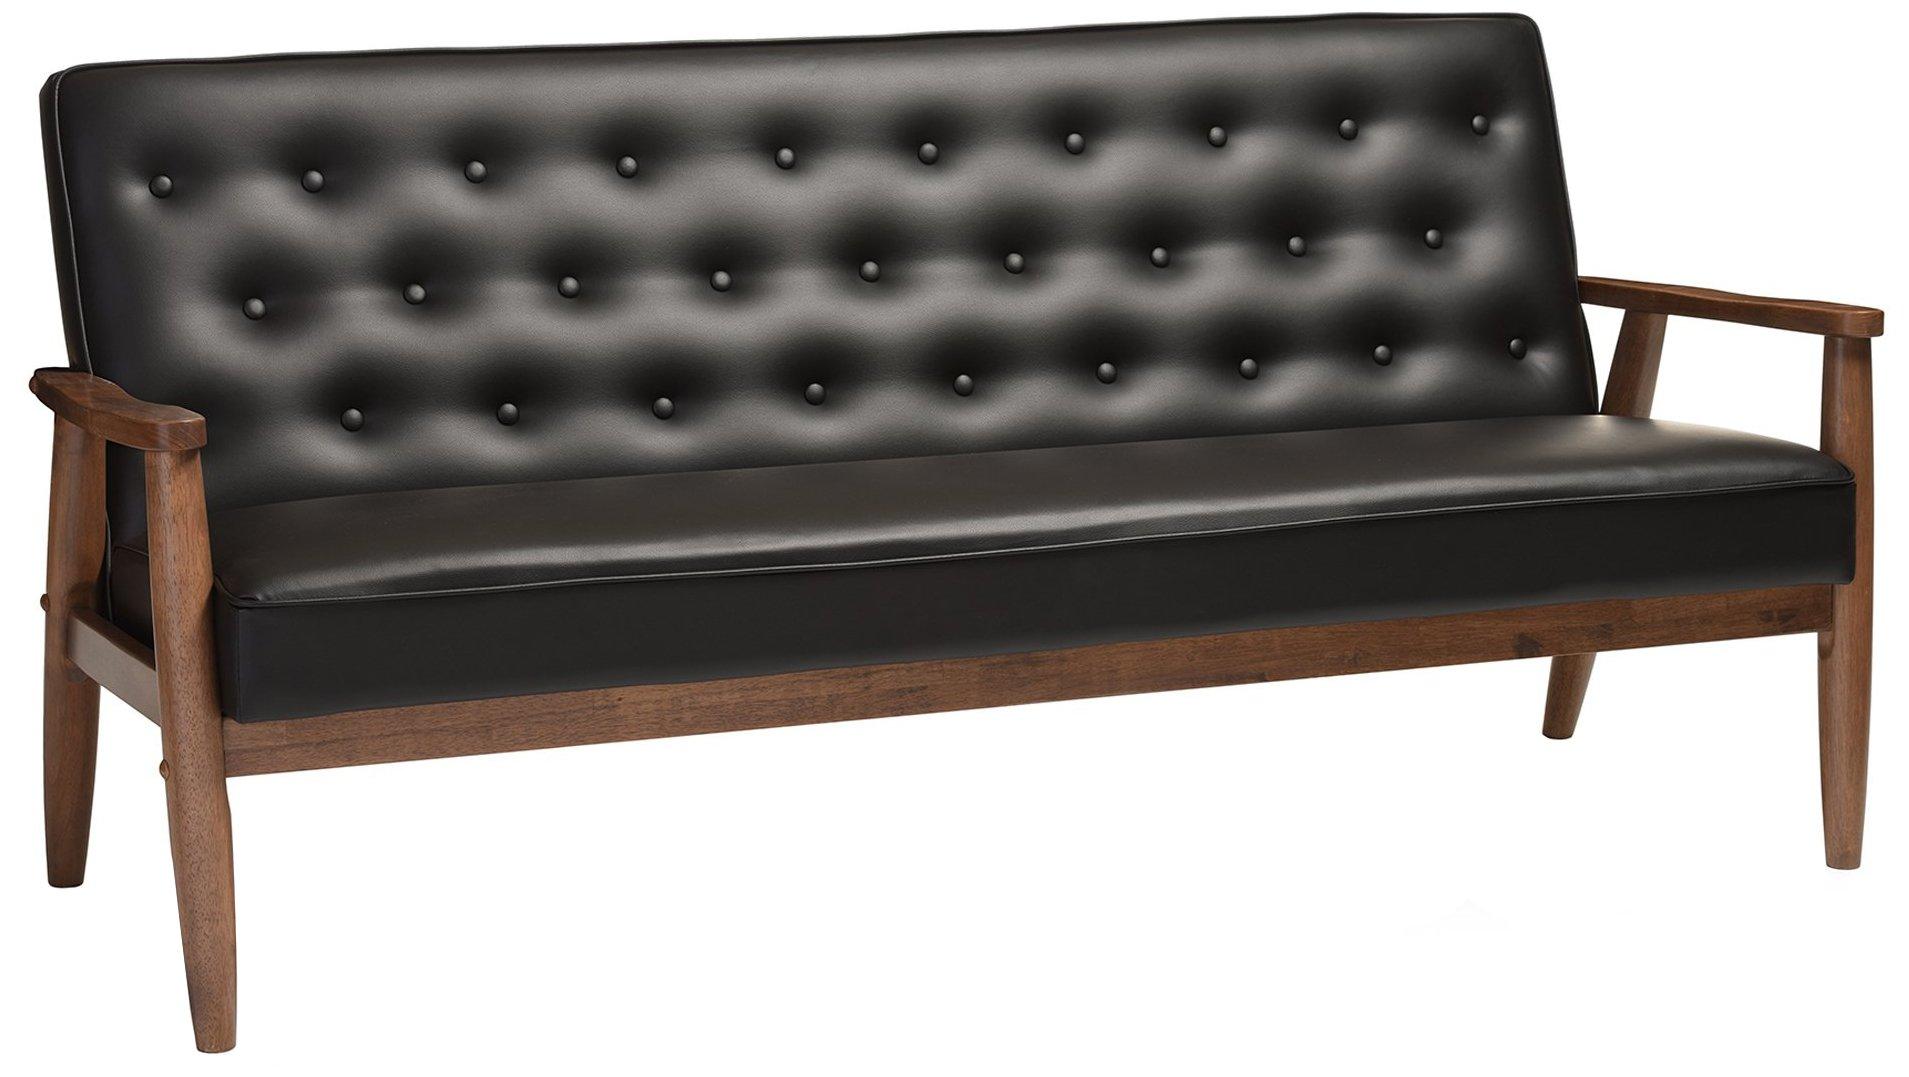 Baxton Studio Sorrento Mid-Century Retro Modern Faux Leather Upholstered Wooden 3-Seater Sofa, Black by Baxton Studio